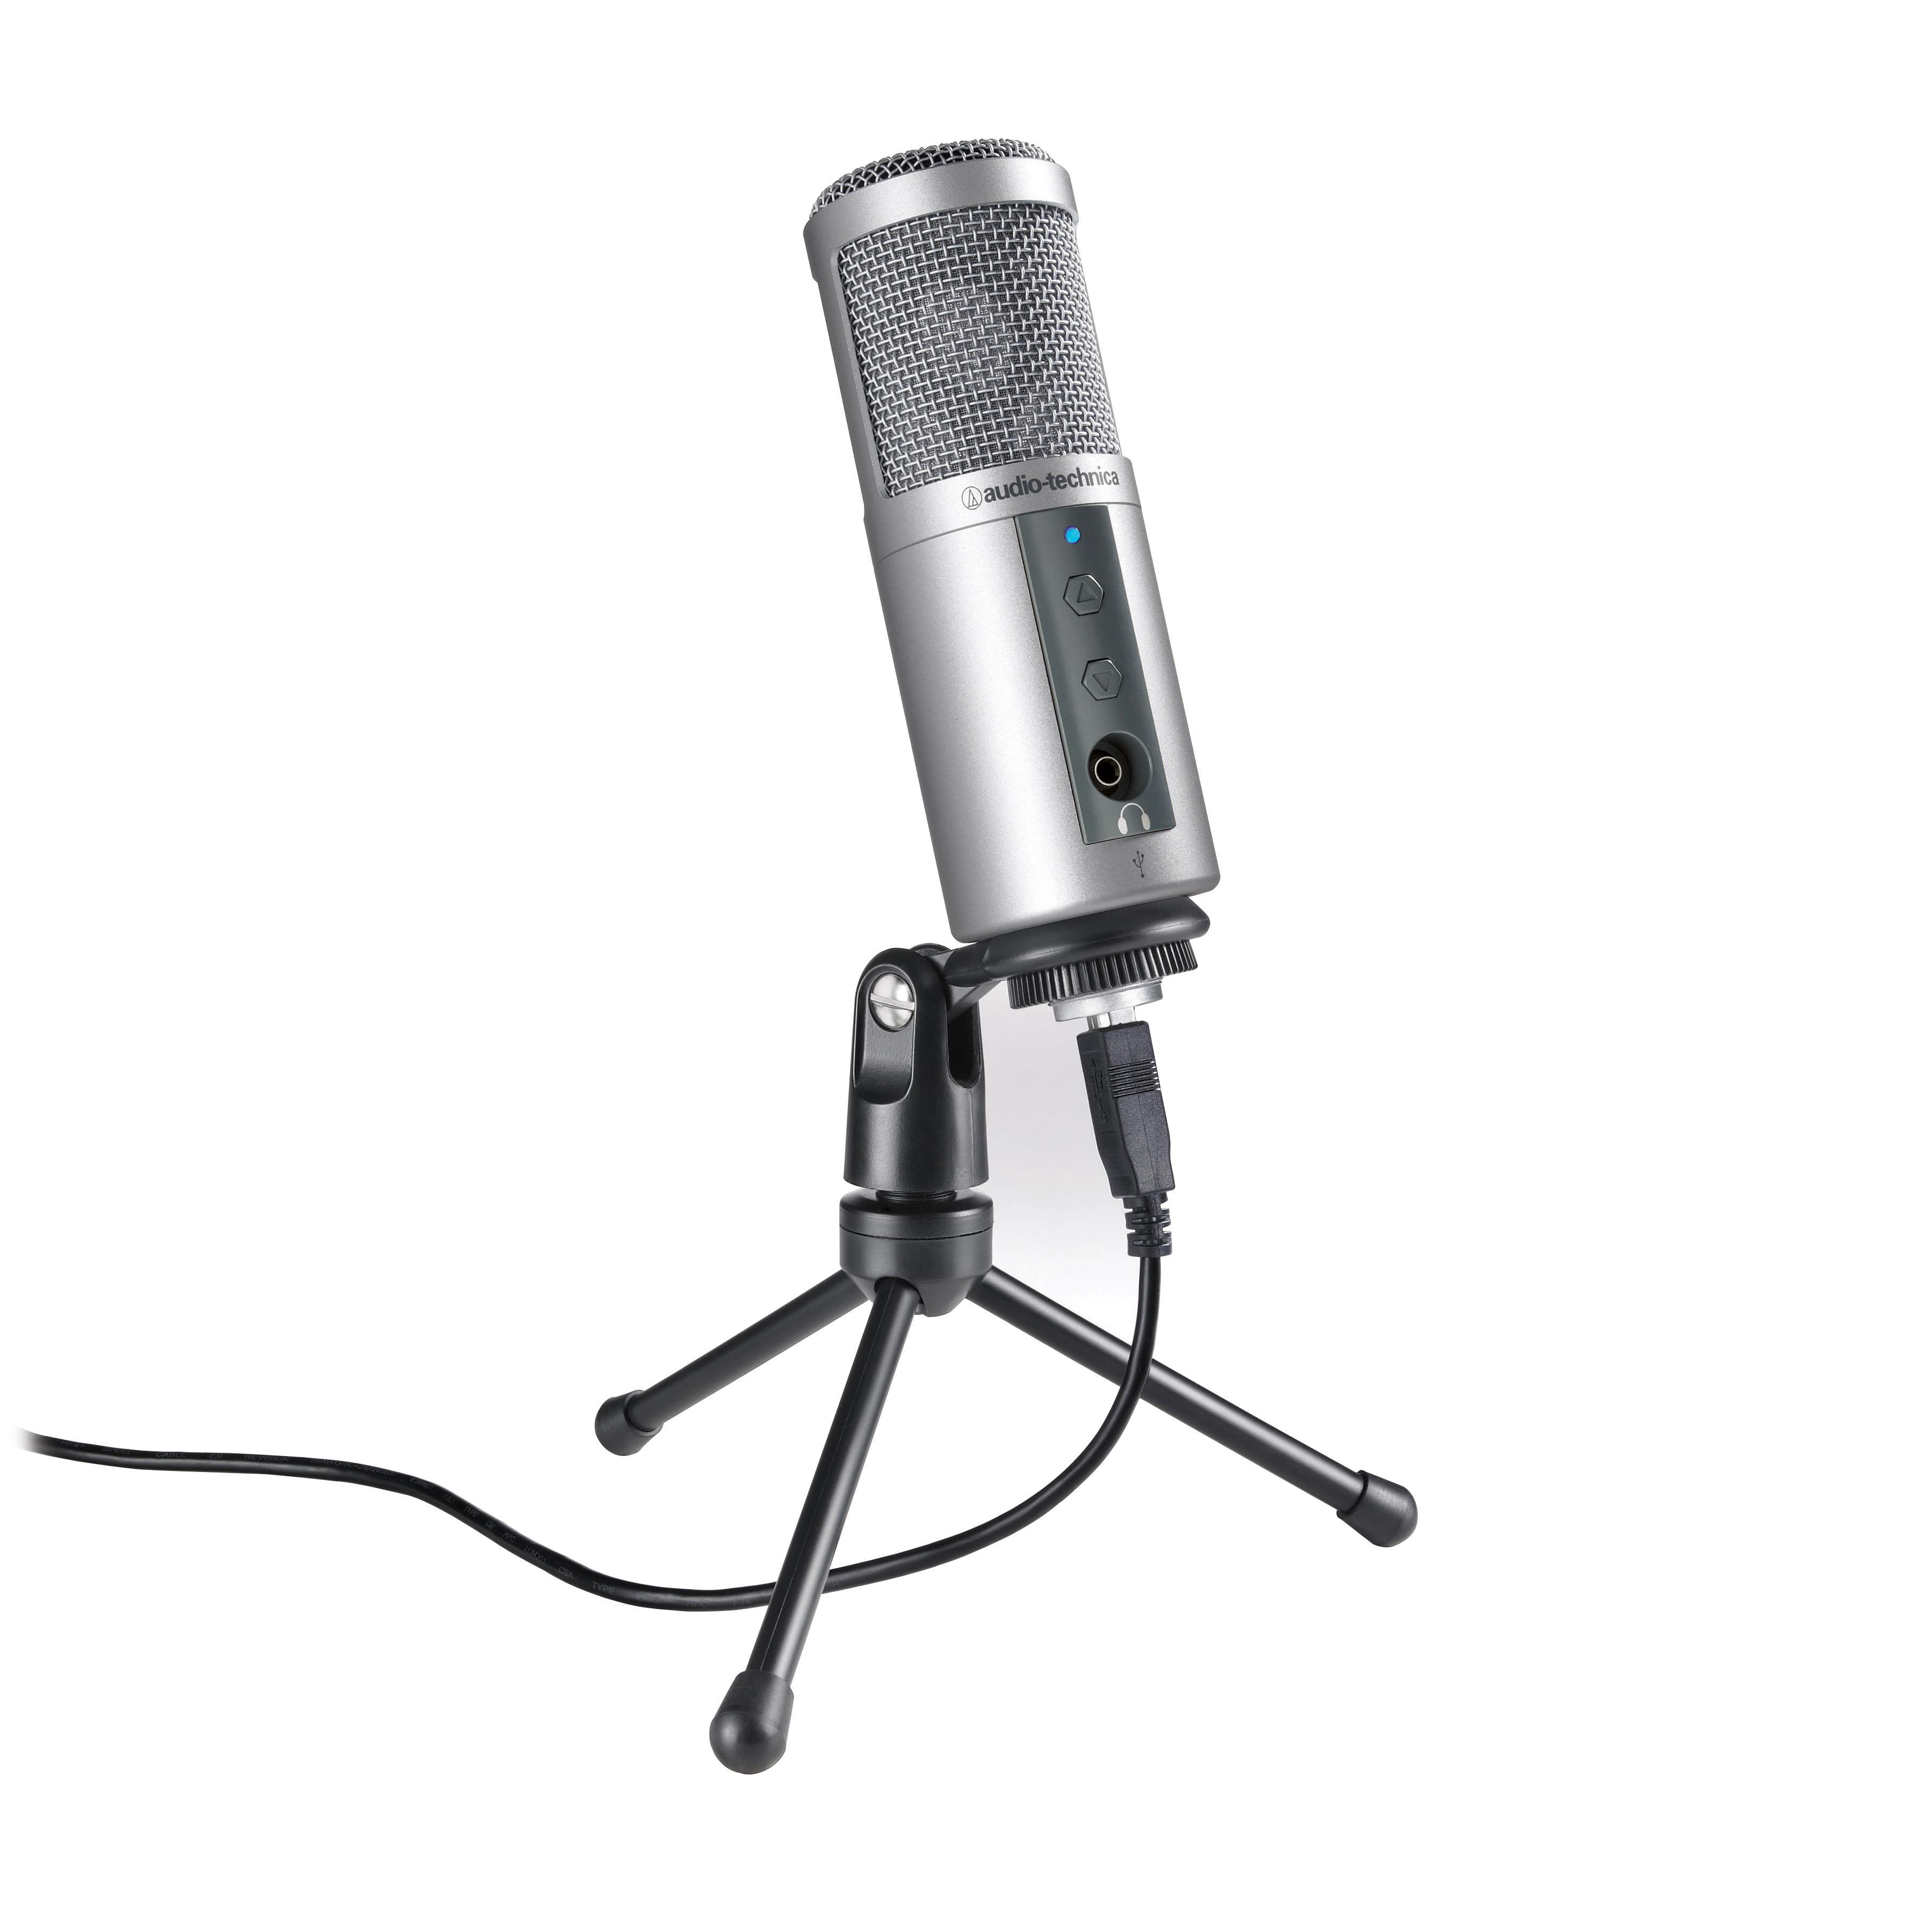 Audio Technica Atr2500 Usb Cardioid Condenser Usb